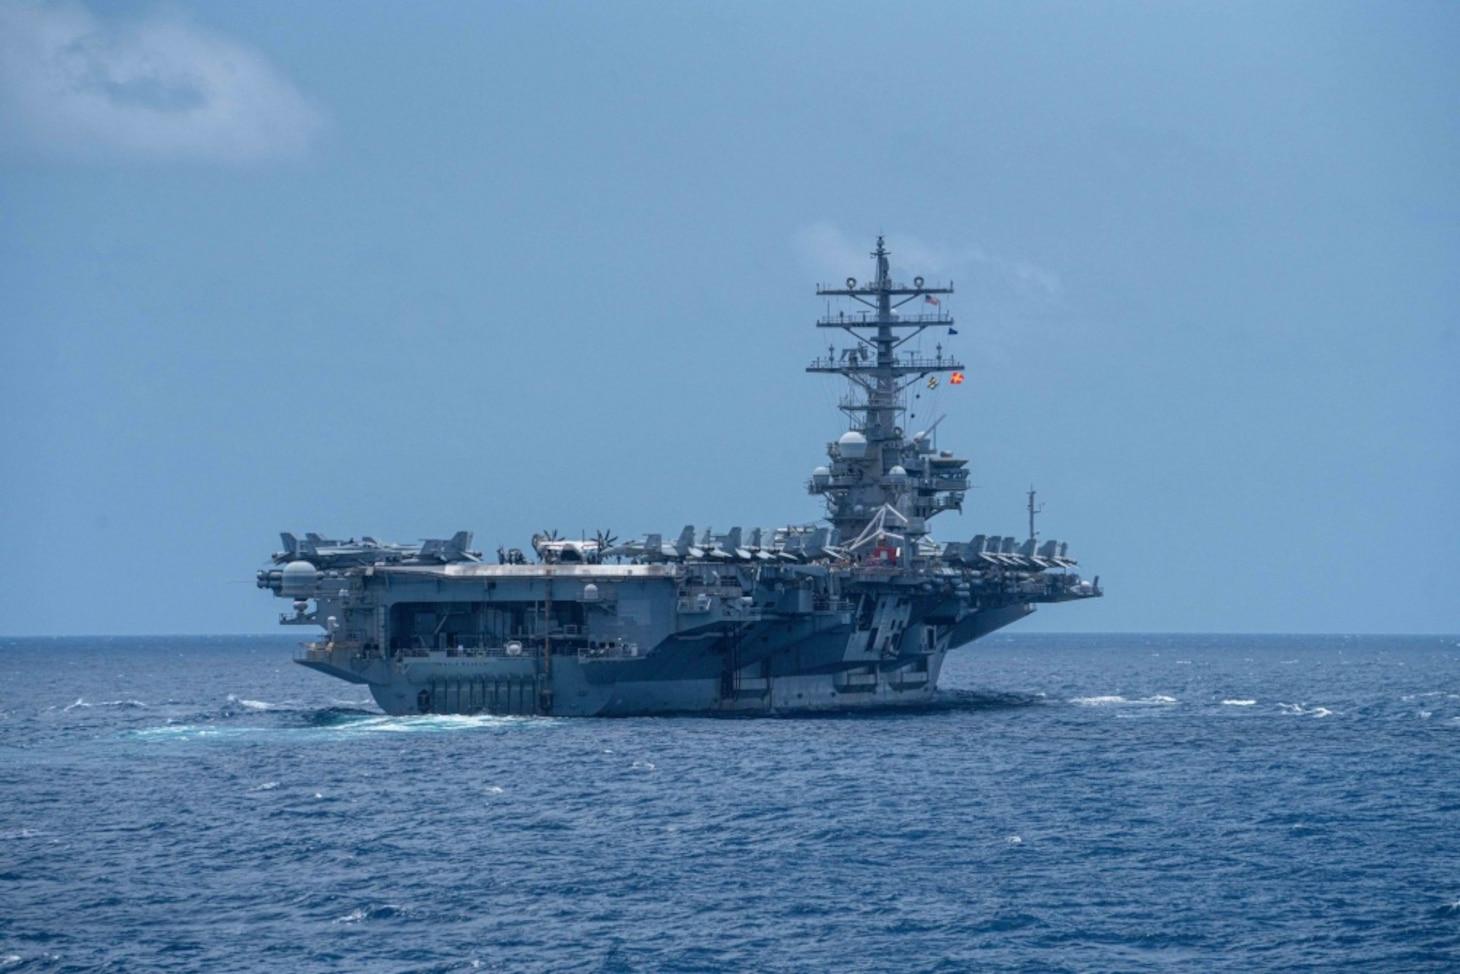 U.S Navy • Aircraft Carrier • USS Ronald Reagan • Flight Operations • Indian Ocean